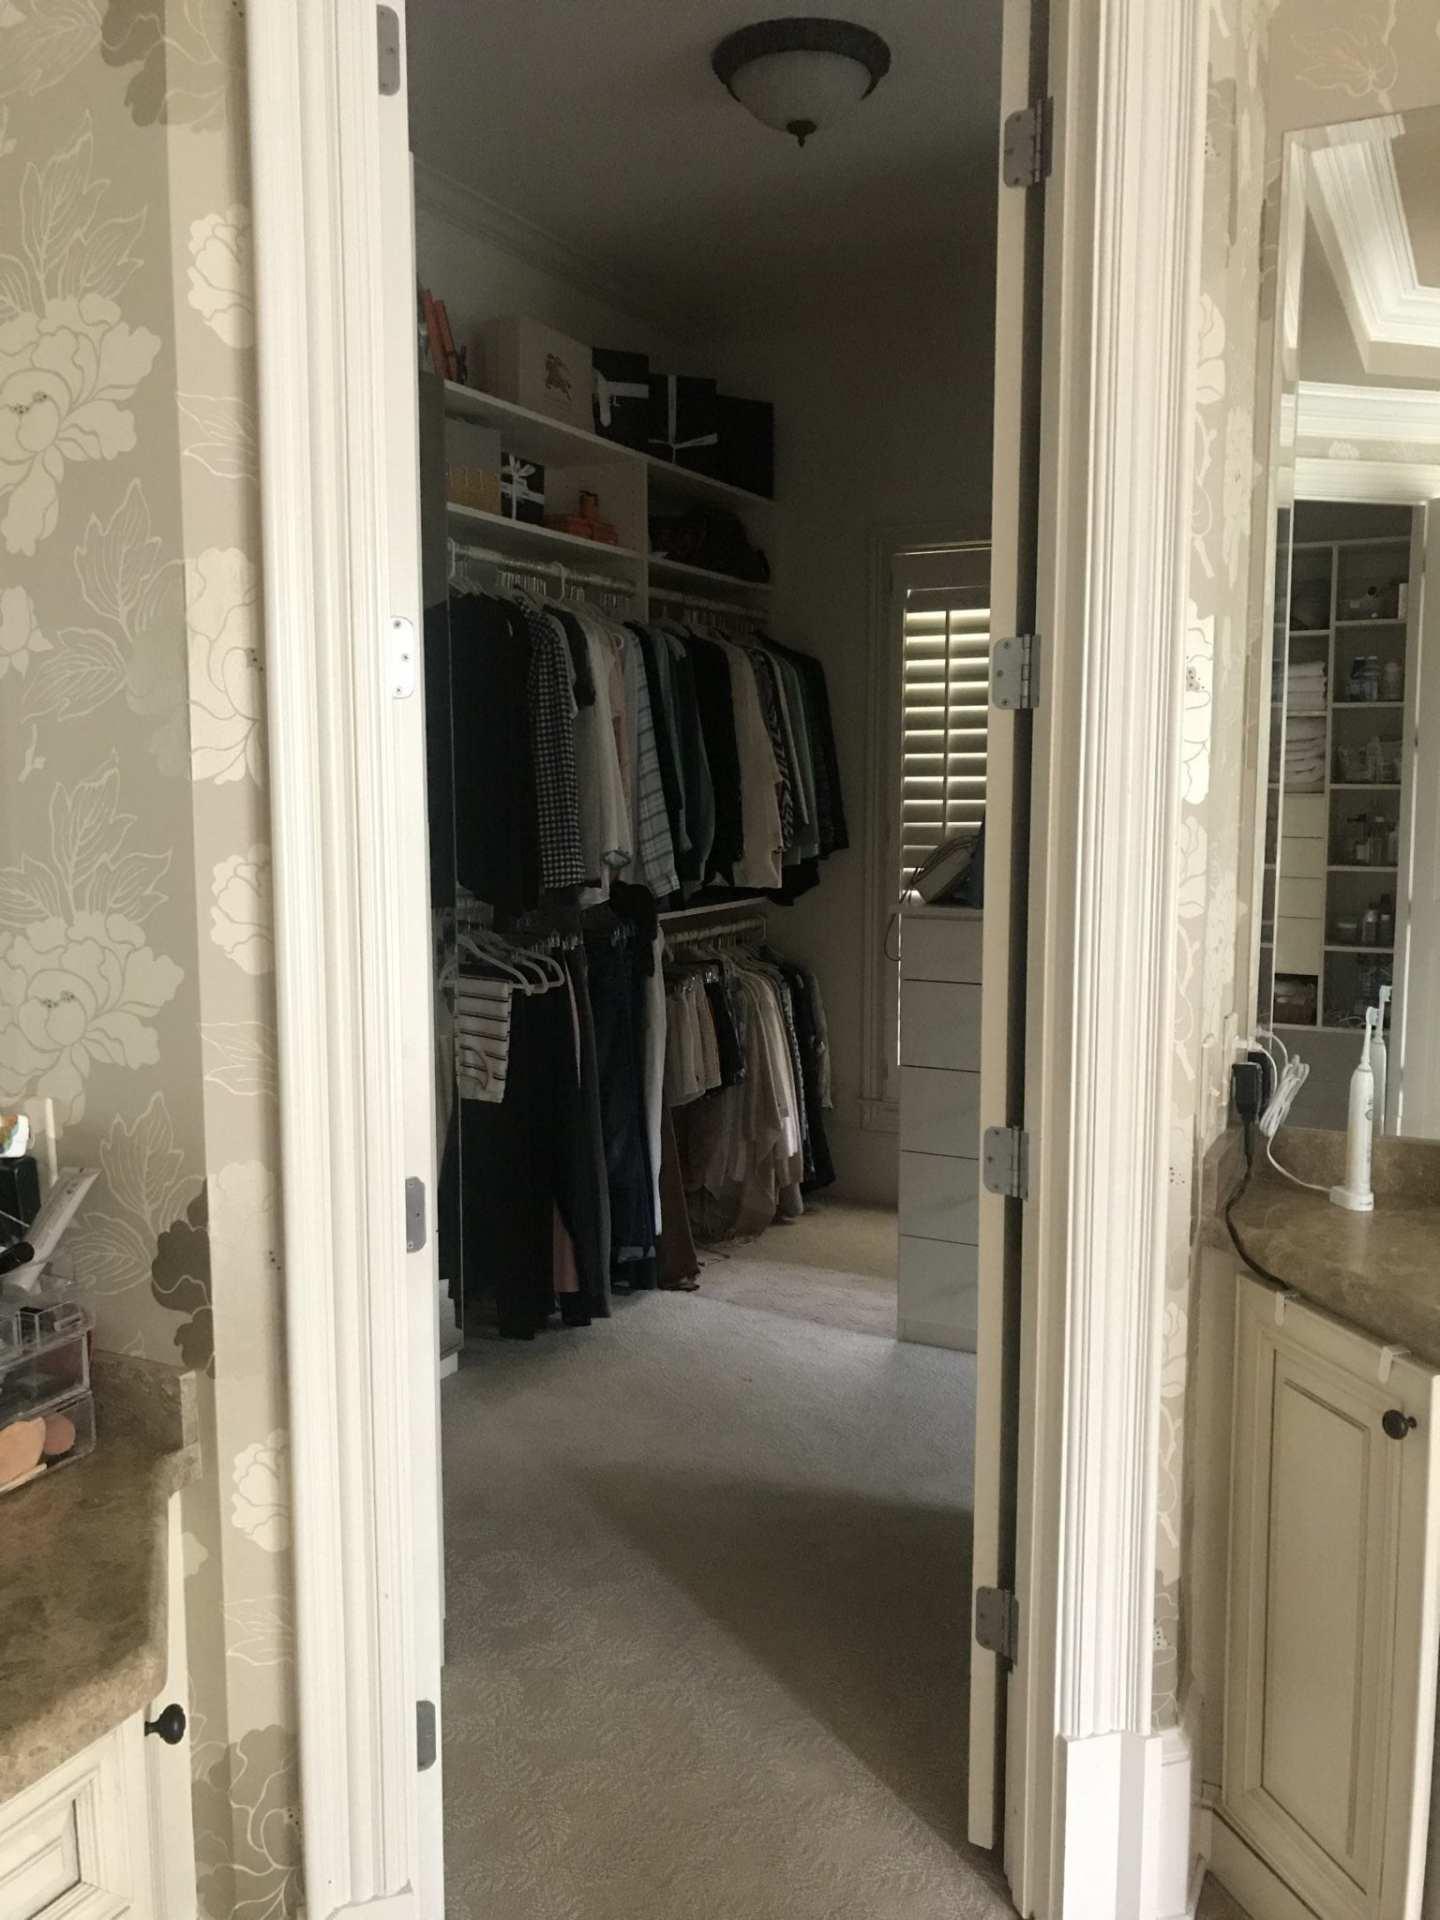 how to organize closets. California Closets near me for organizing tips and custom closets.